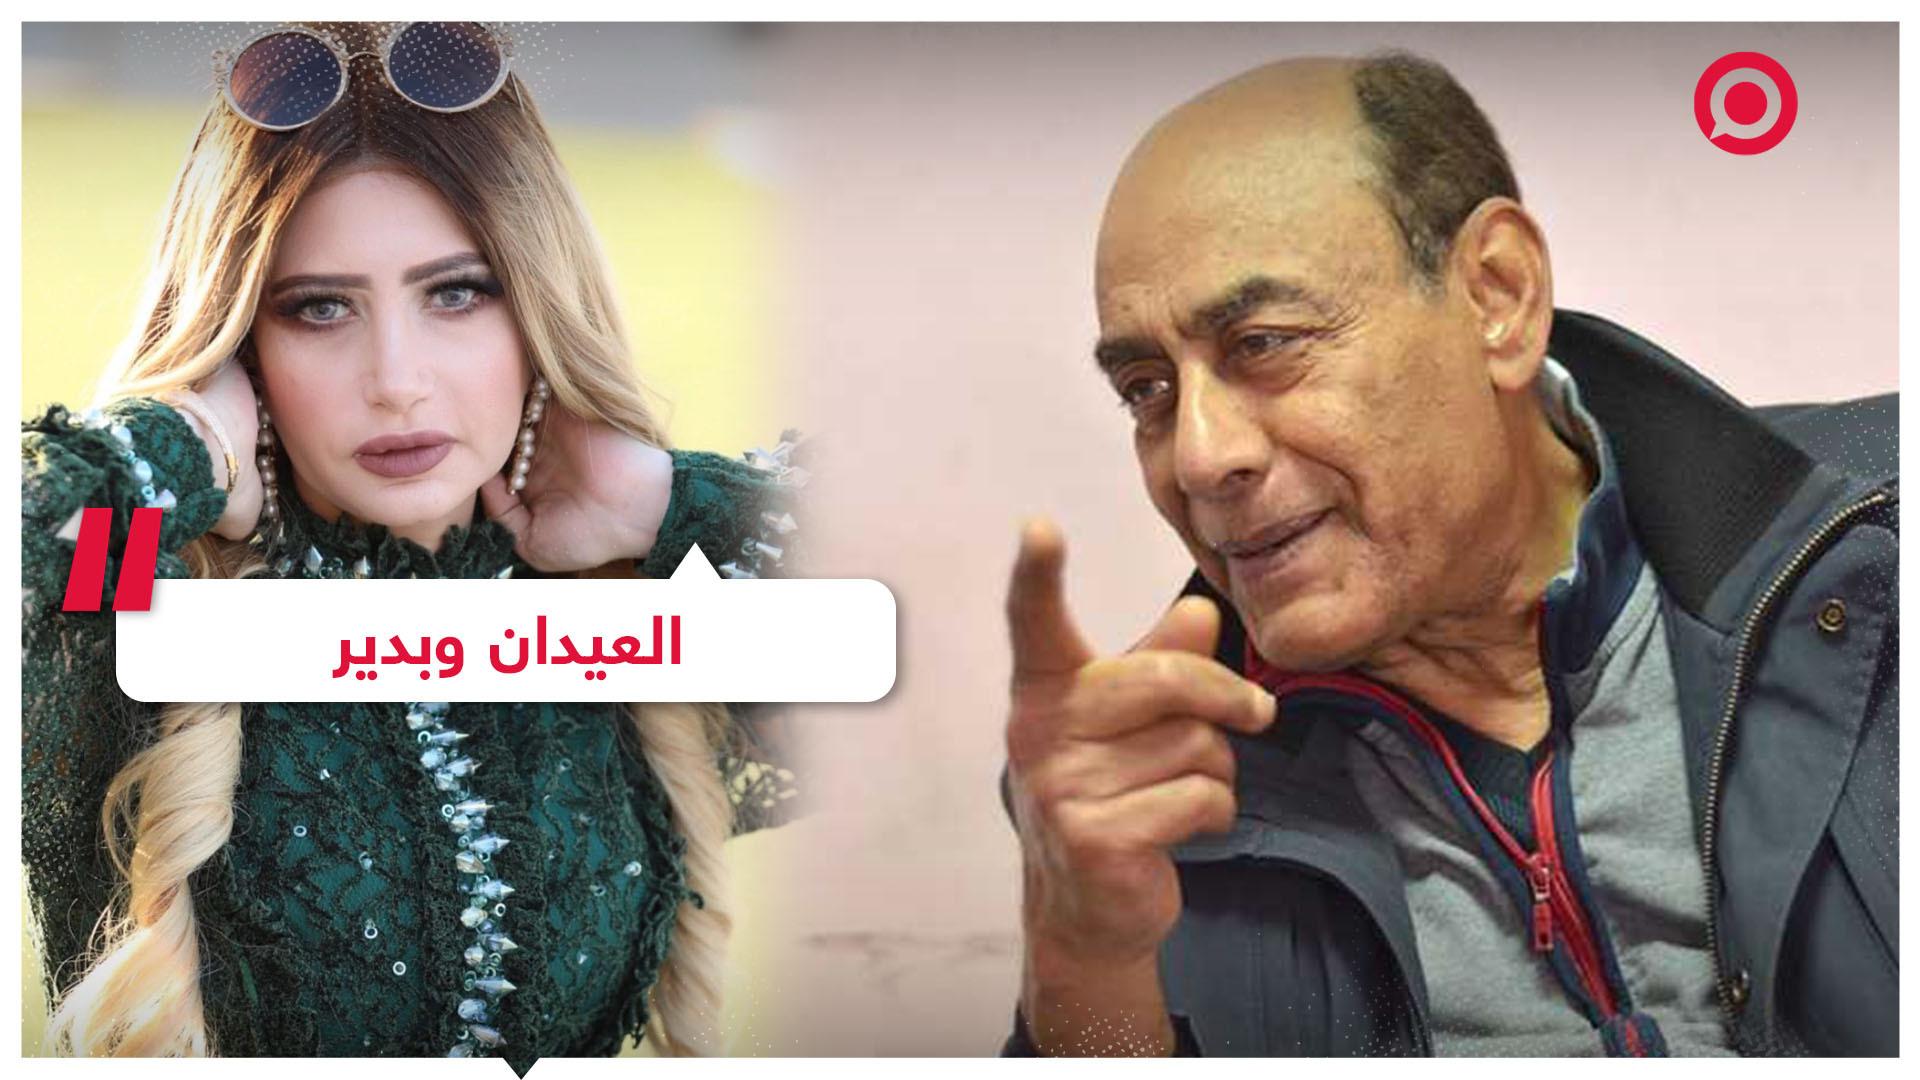 مصر - أحمد بدير - سارة بدير- مي العيدان